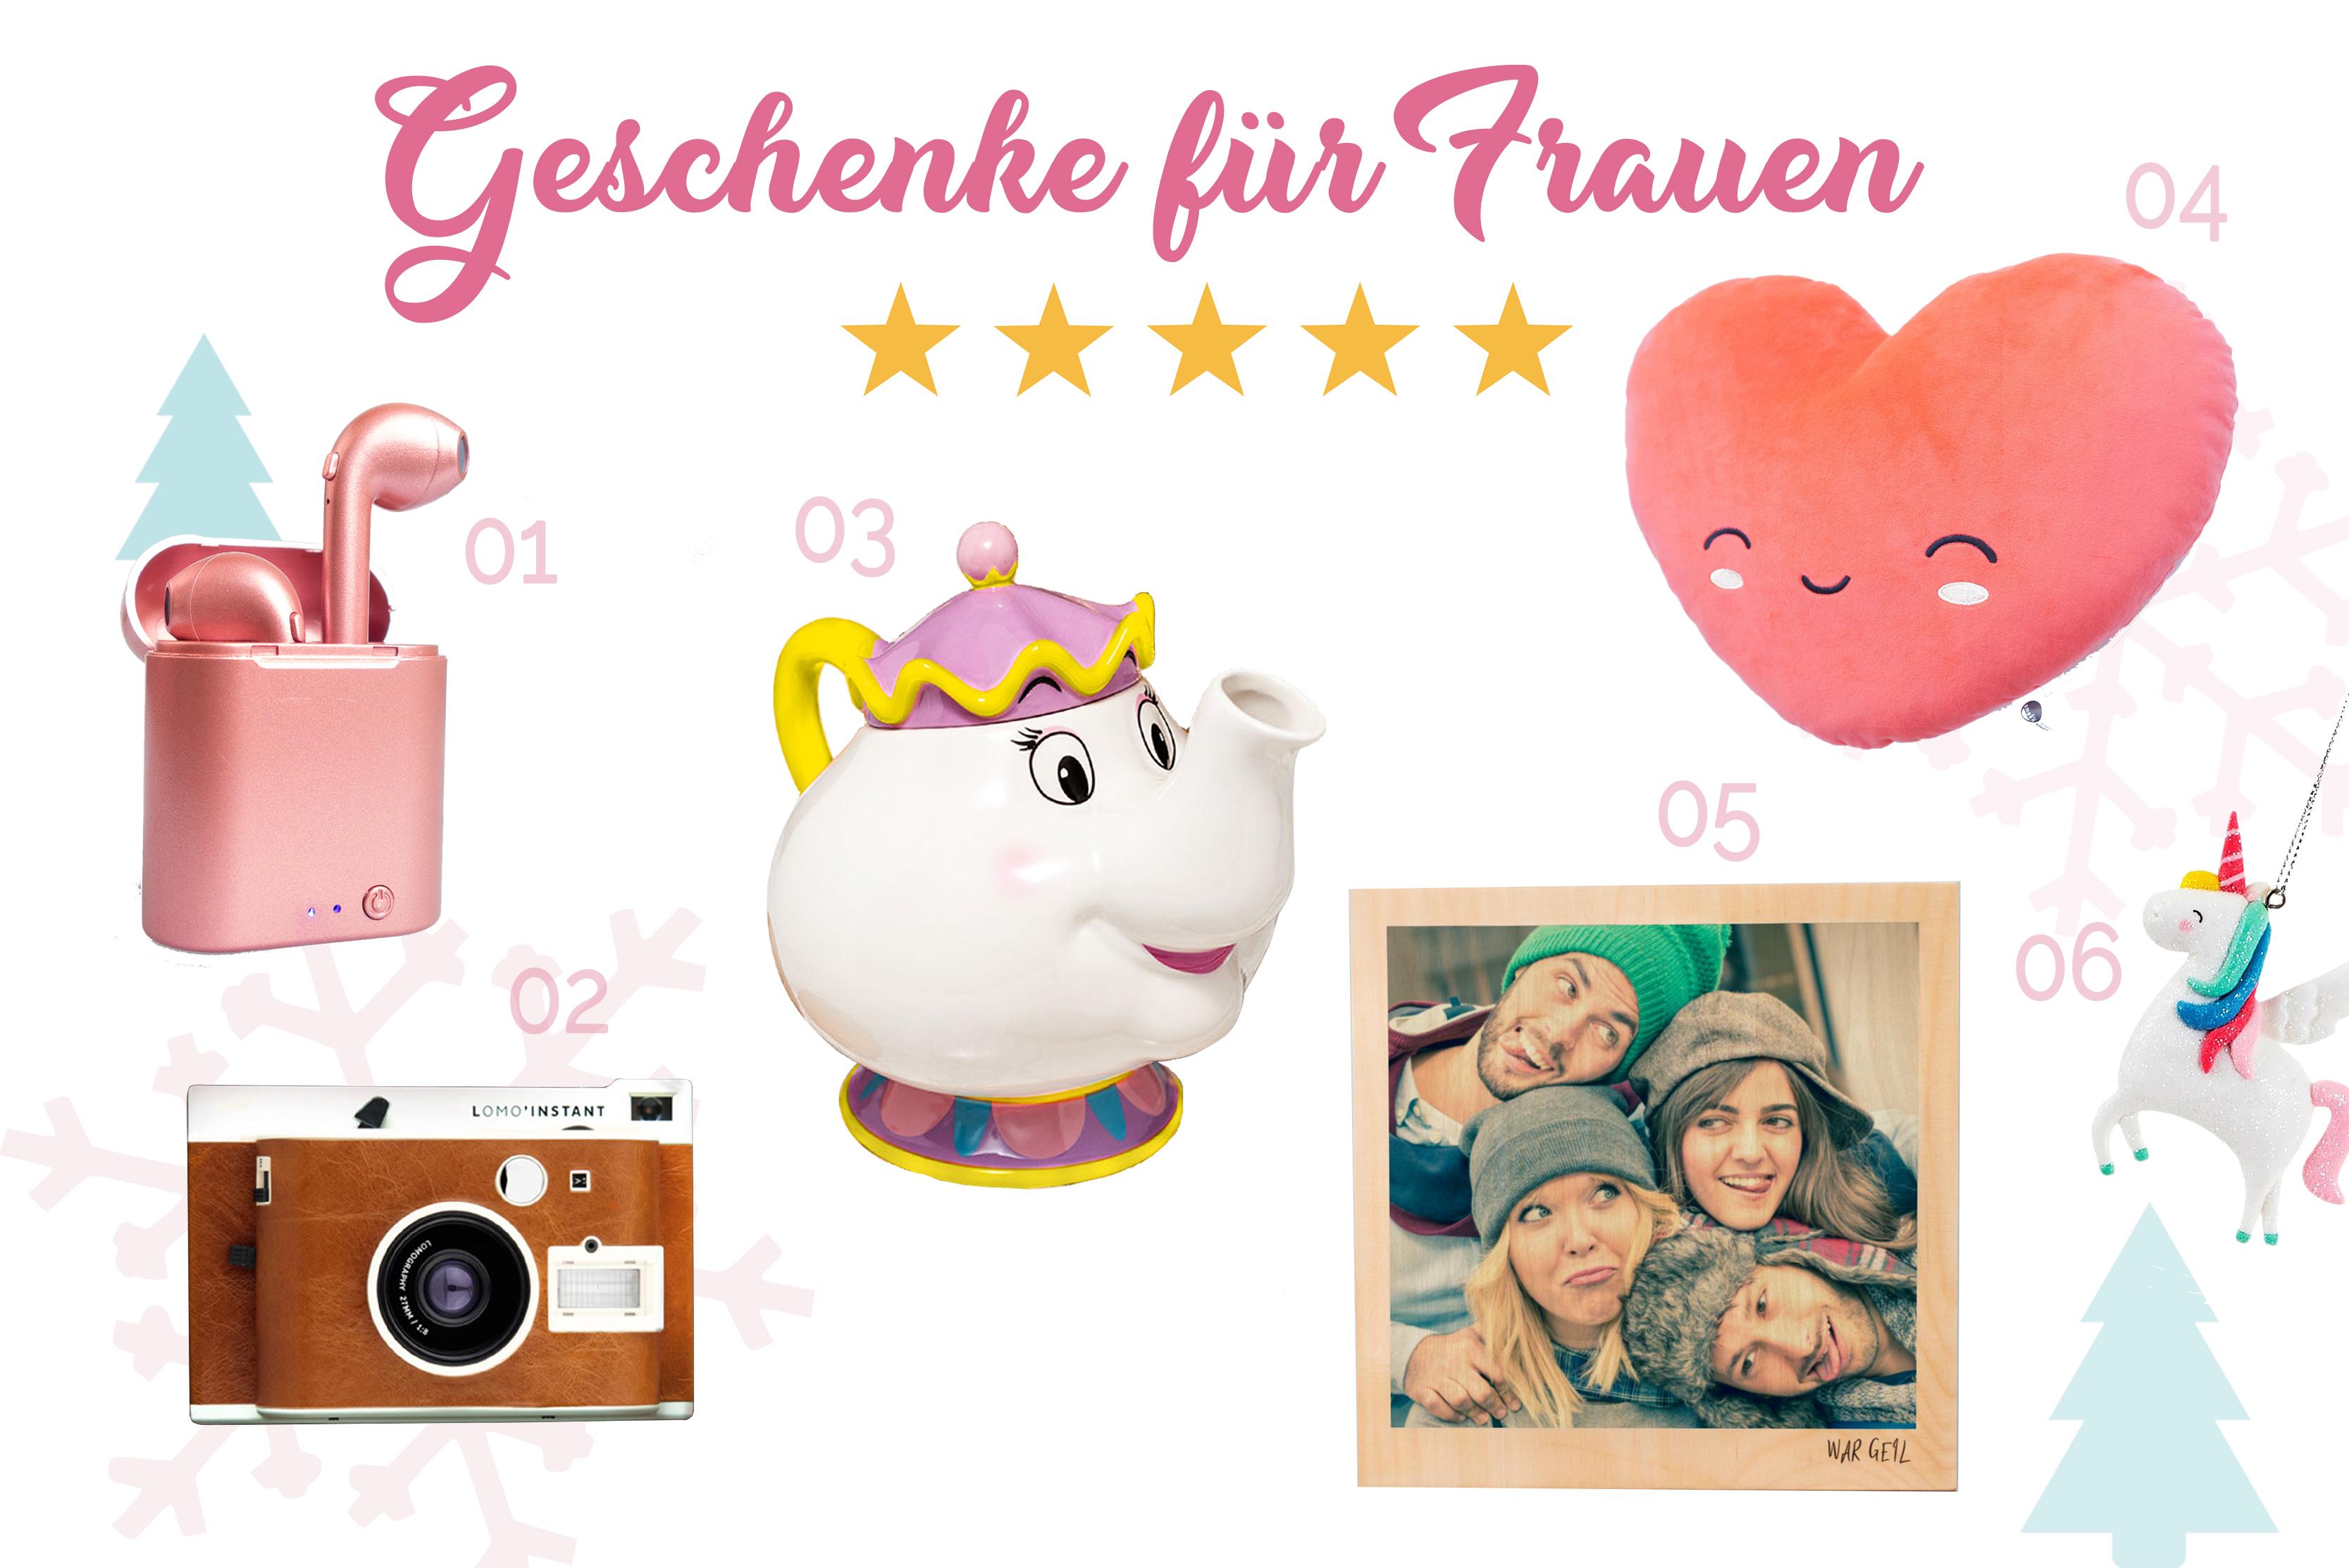 weihnachtsgeschenke-für-freundin-inspiration-geschenkideen-gift-guide